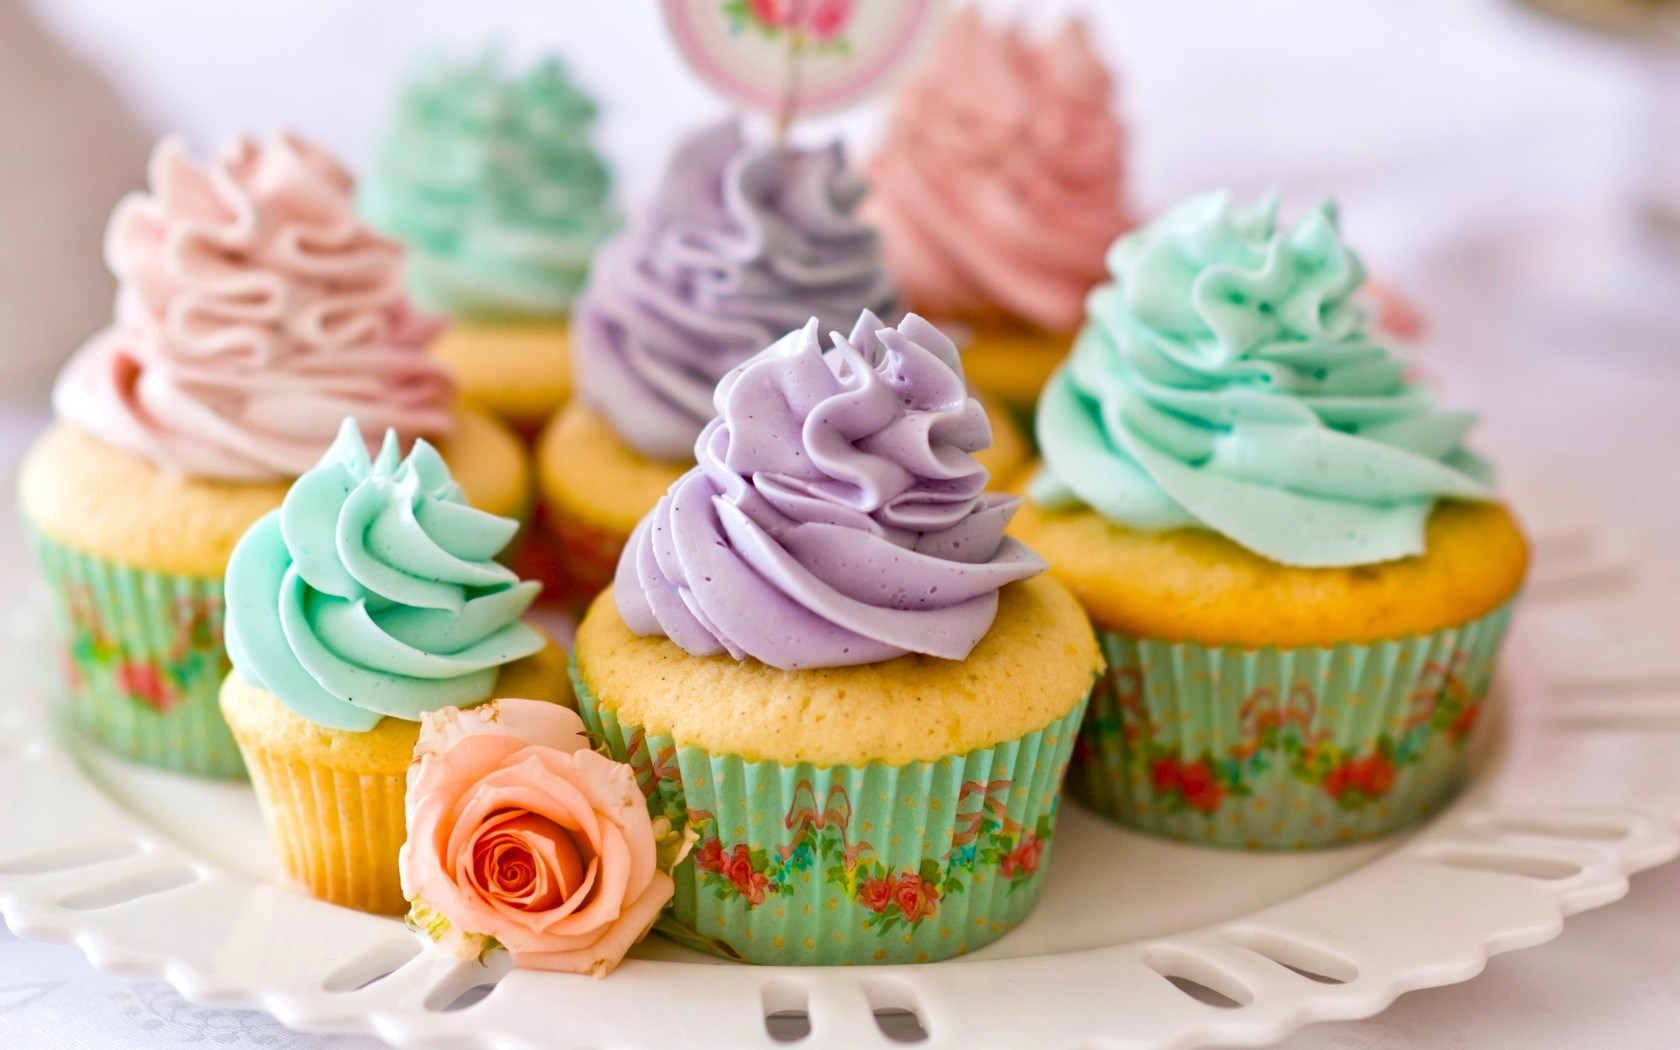 Muffins Cream Sweets Dessert Rose Flower